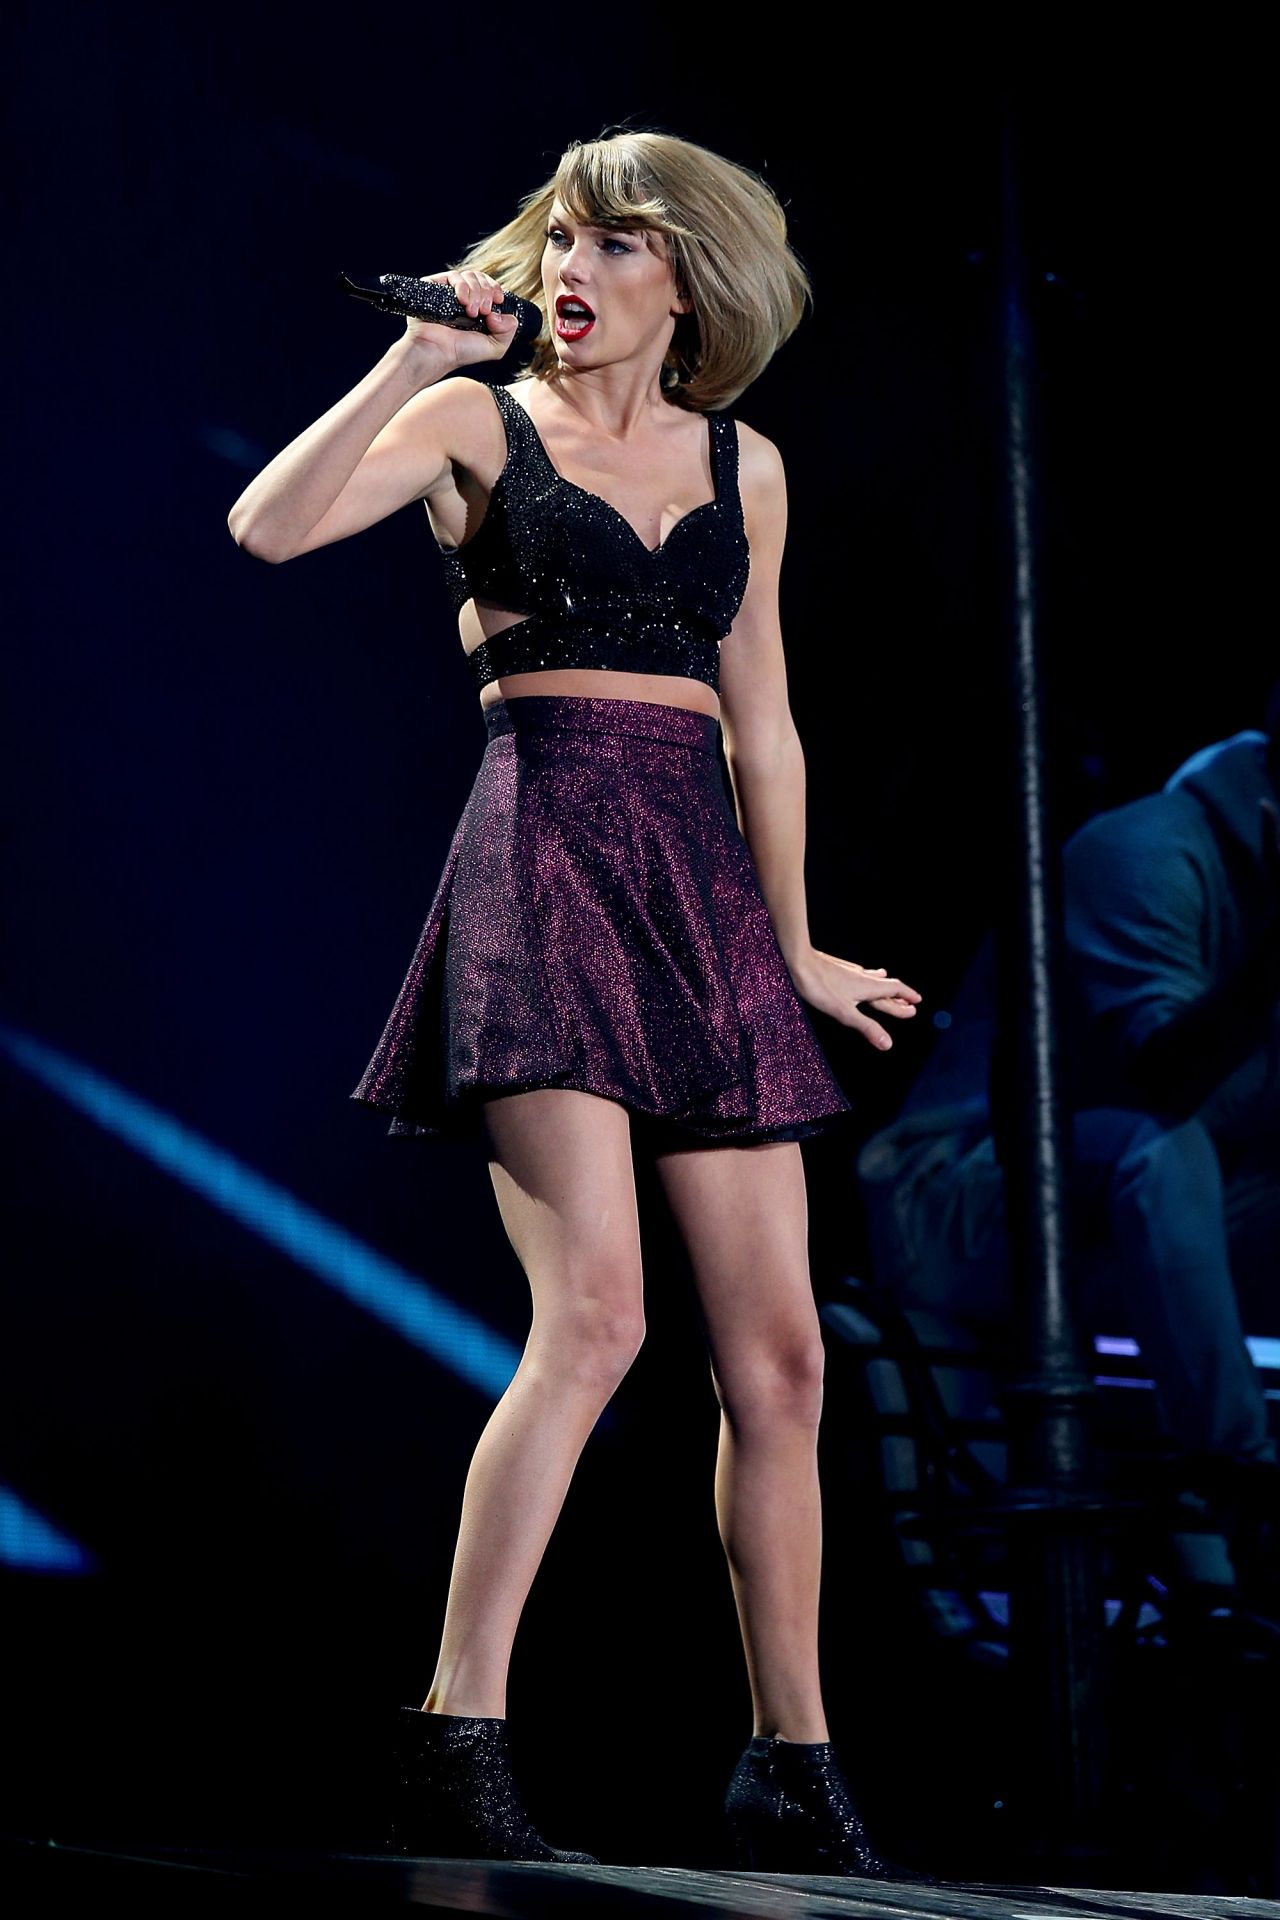 Taylor swift shake it off fullhd - 4 8